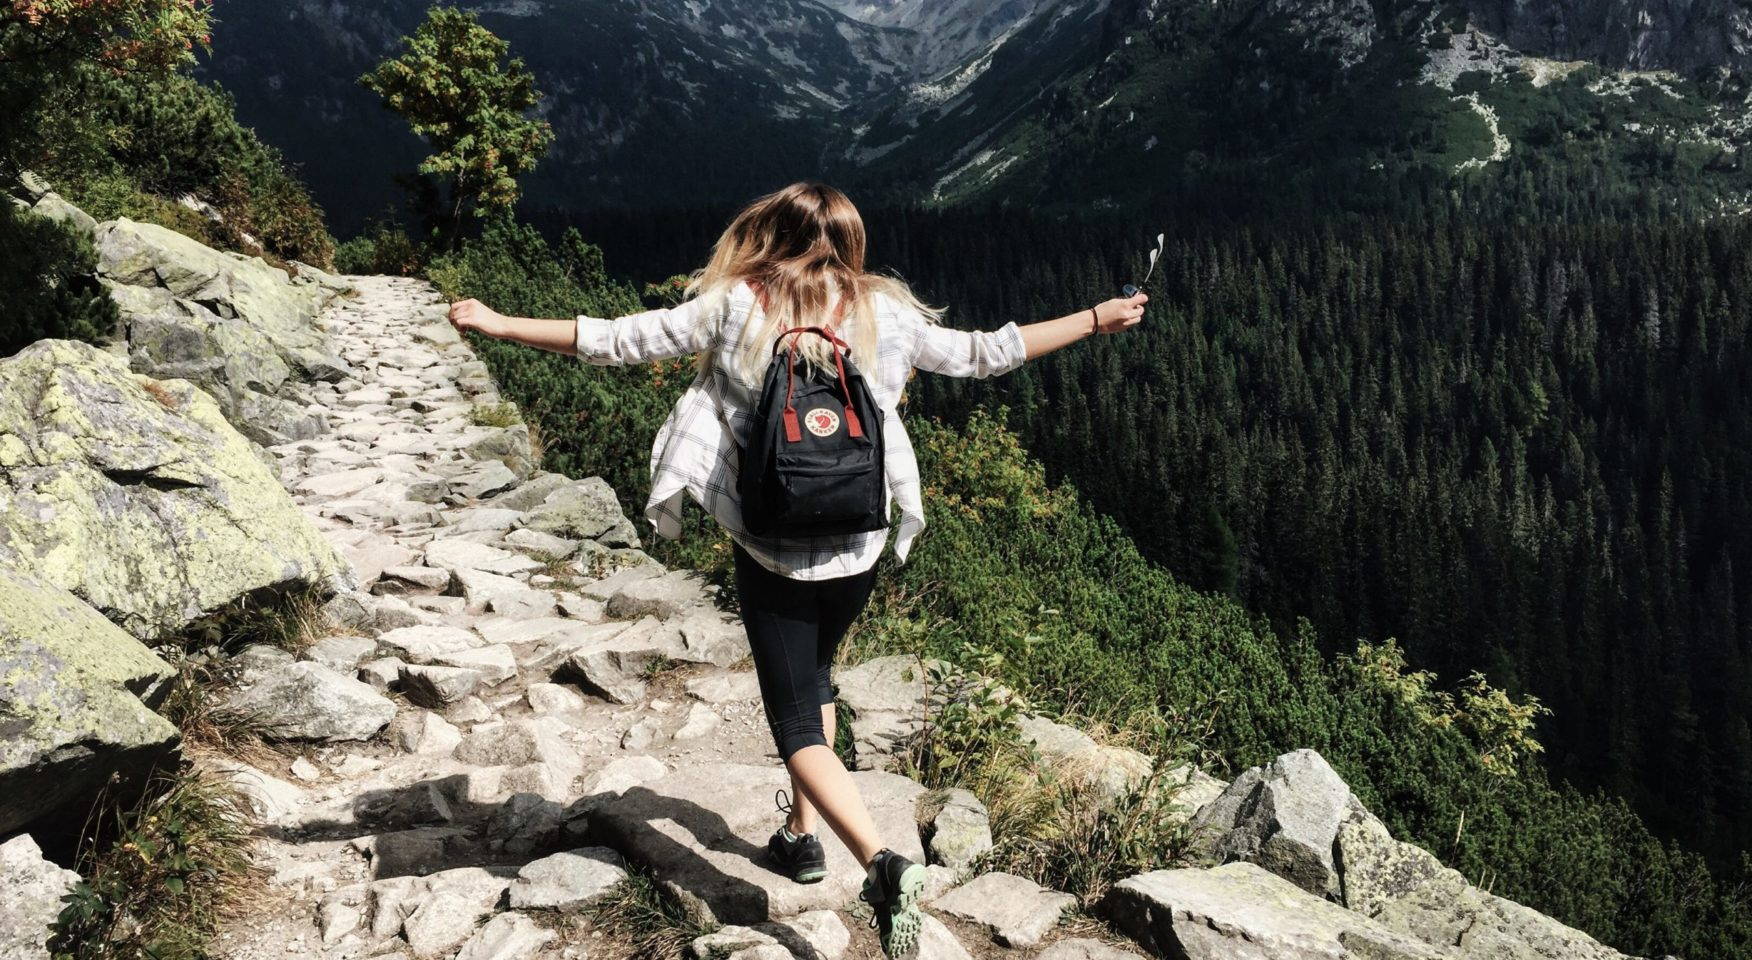 woman hiking on mountain rocks